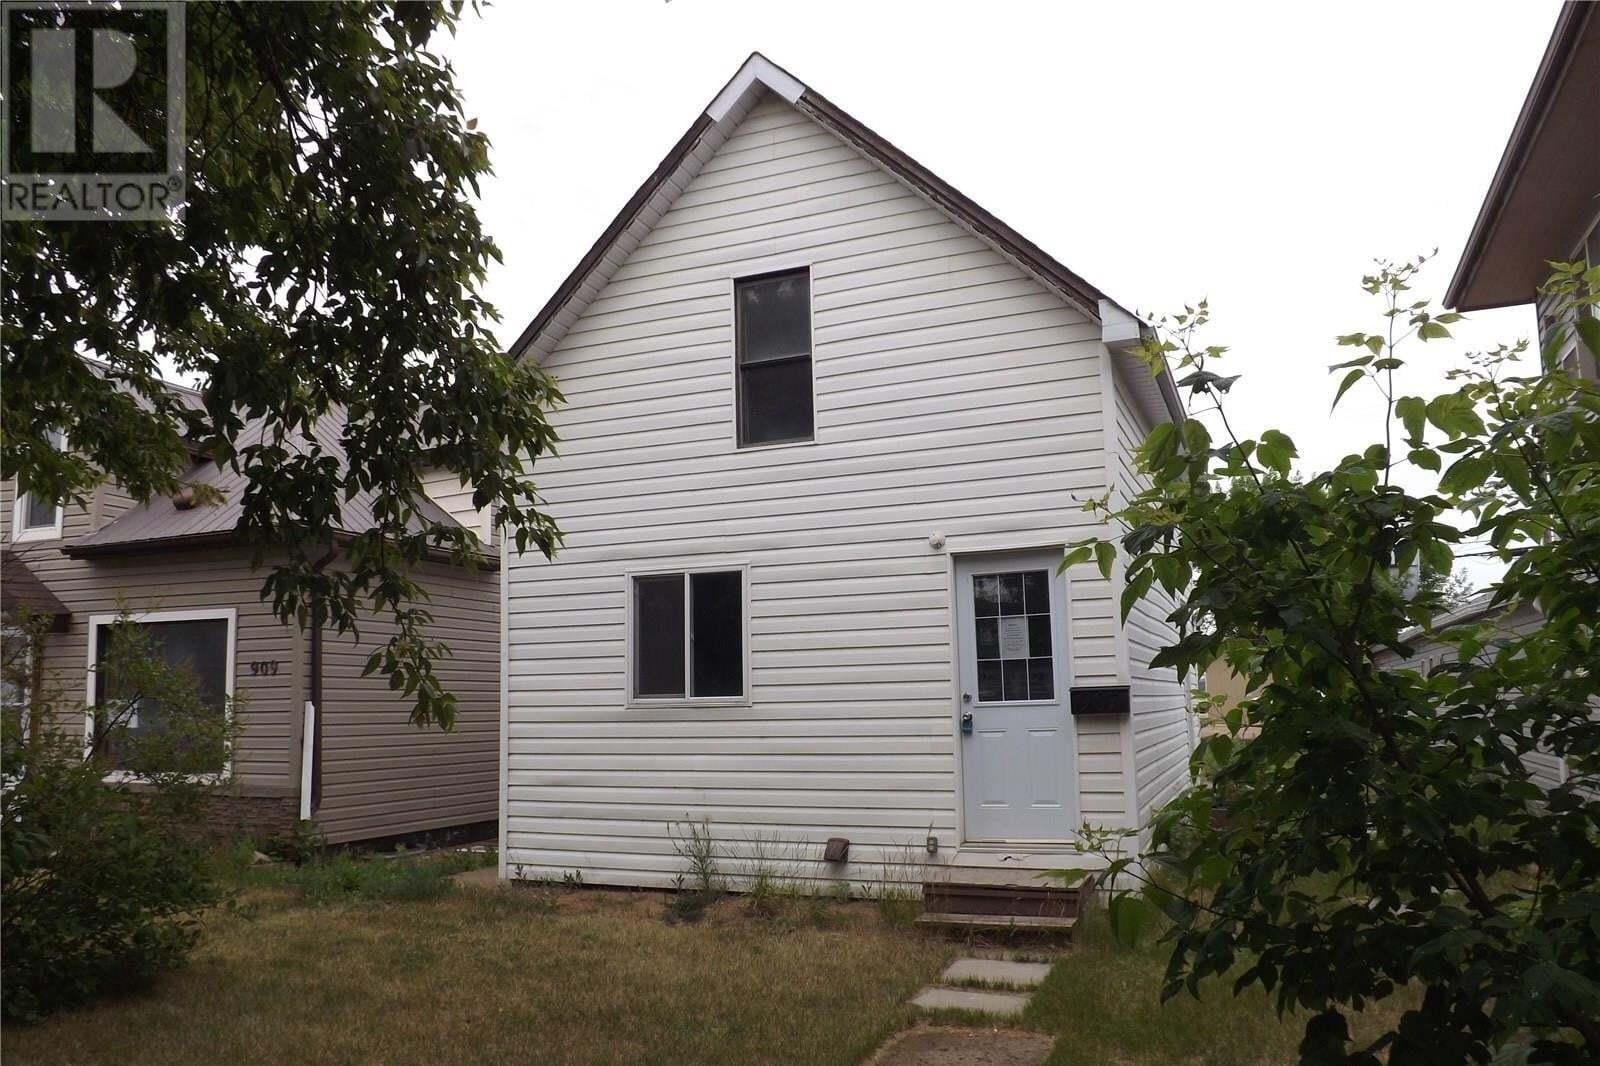 House for sale at 907 4th St Estevan Saskatchewan - MLS: SK830451